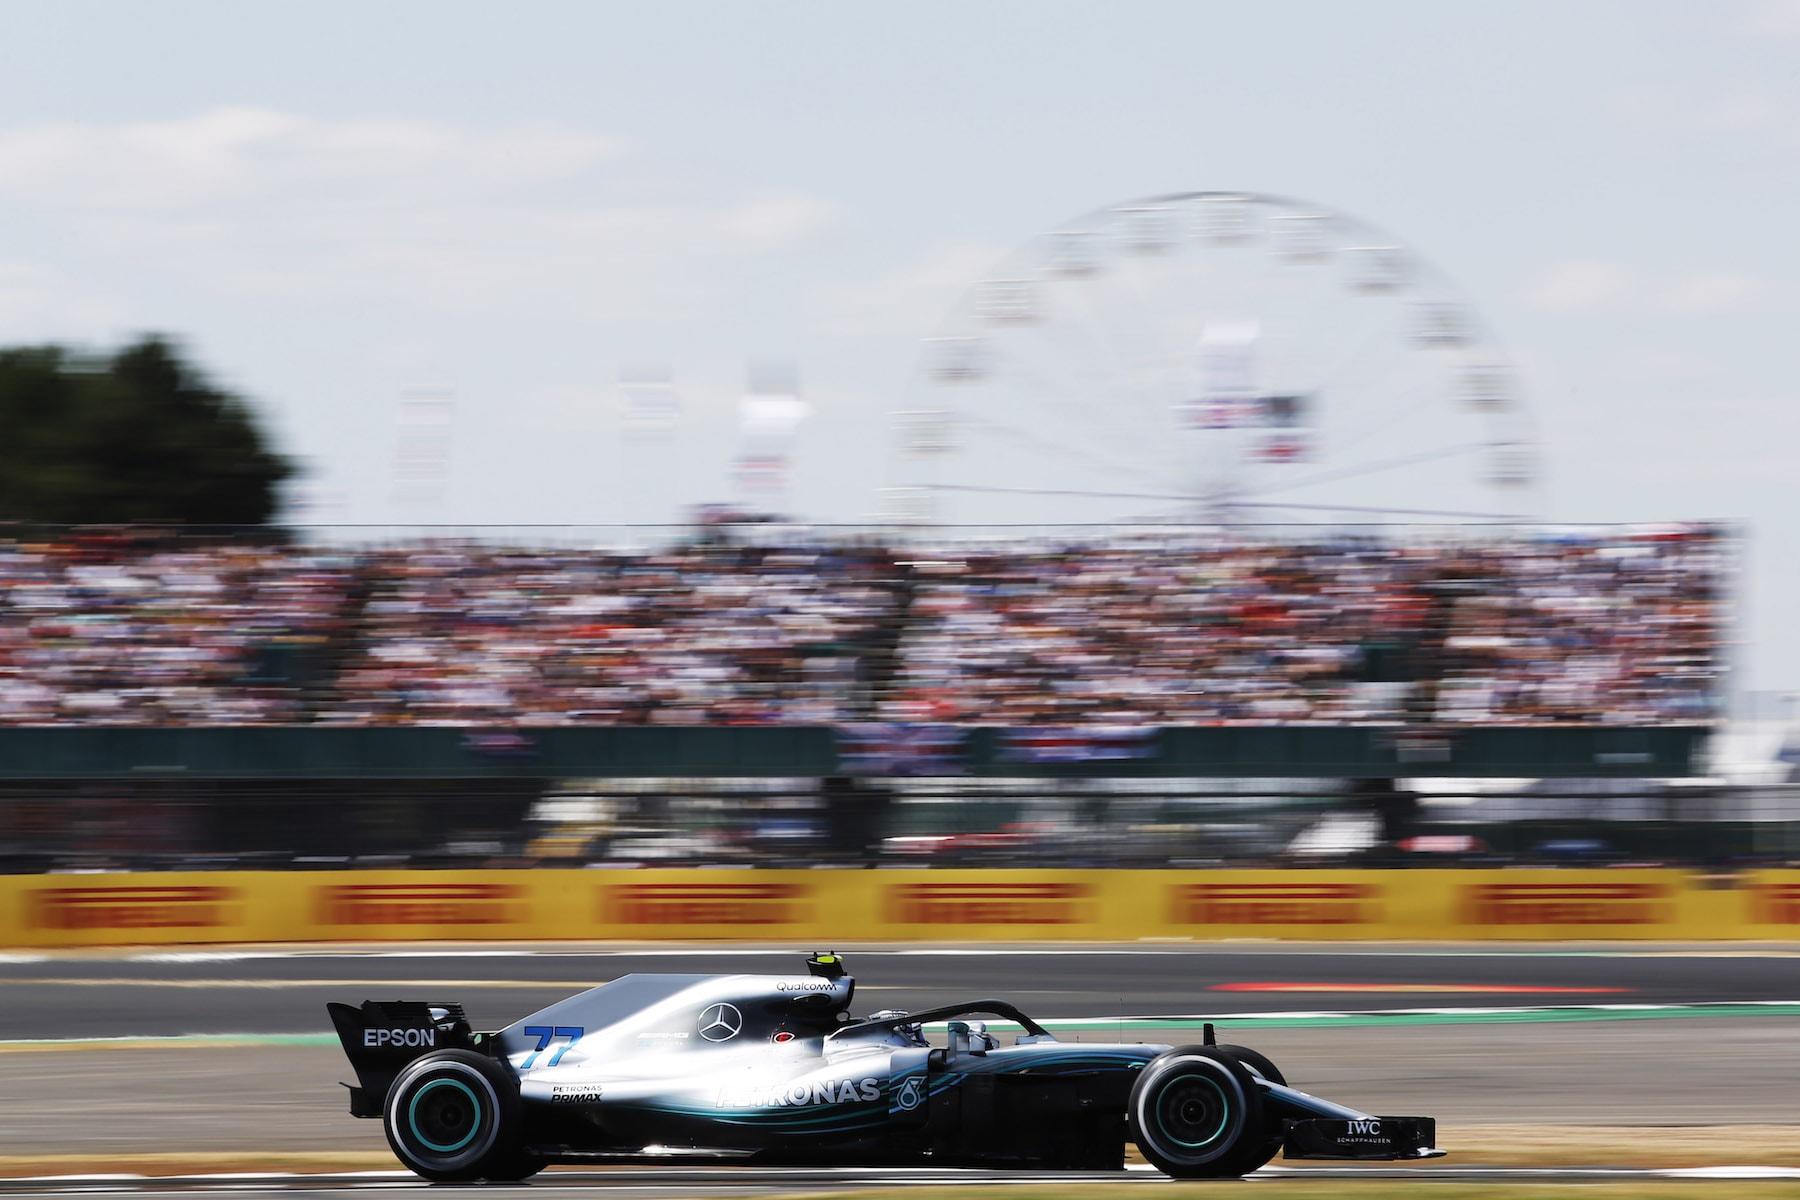 H 2018 Valtteri Bottas | Mercedes W09 | 2018 British GP P4 1 copy.jpg